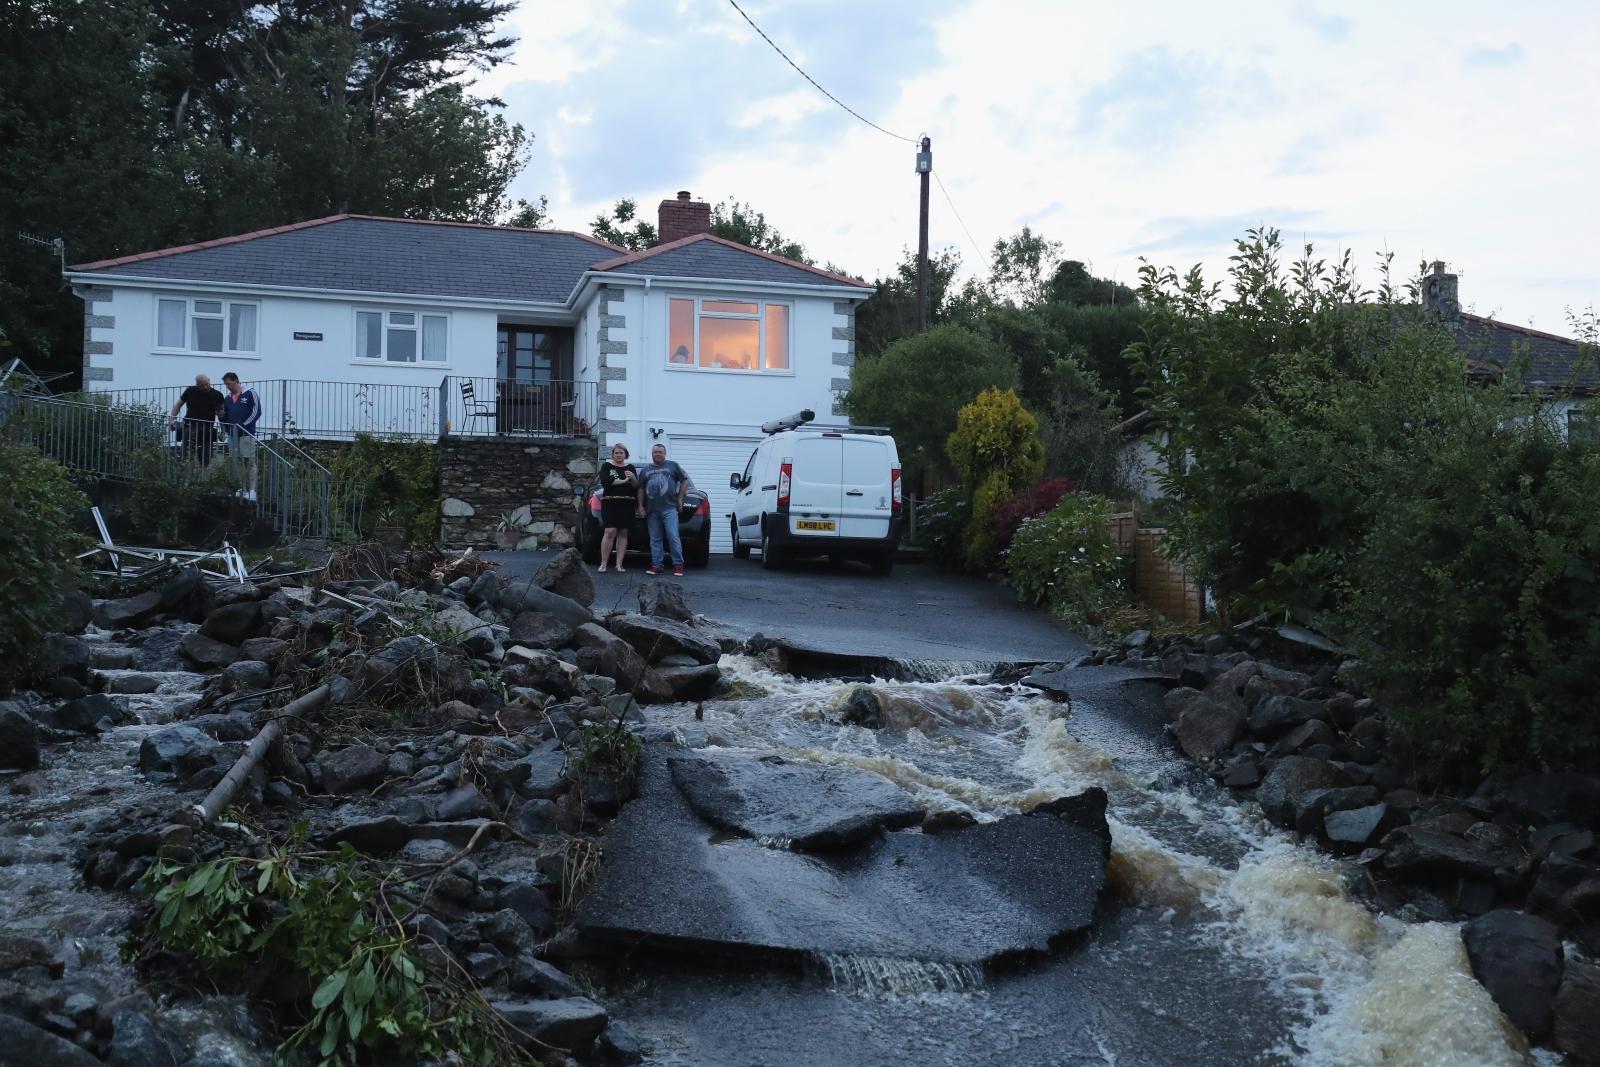 Coverack flash floods